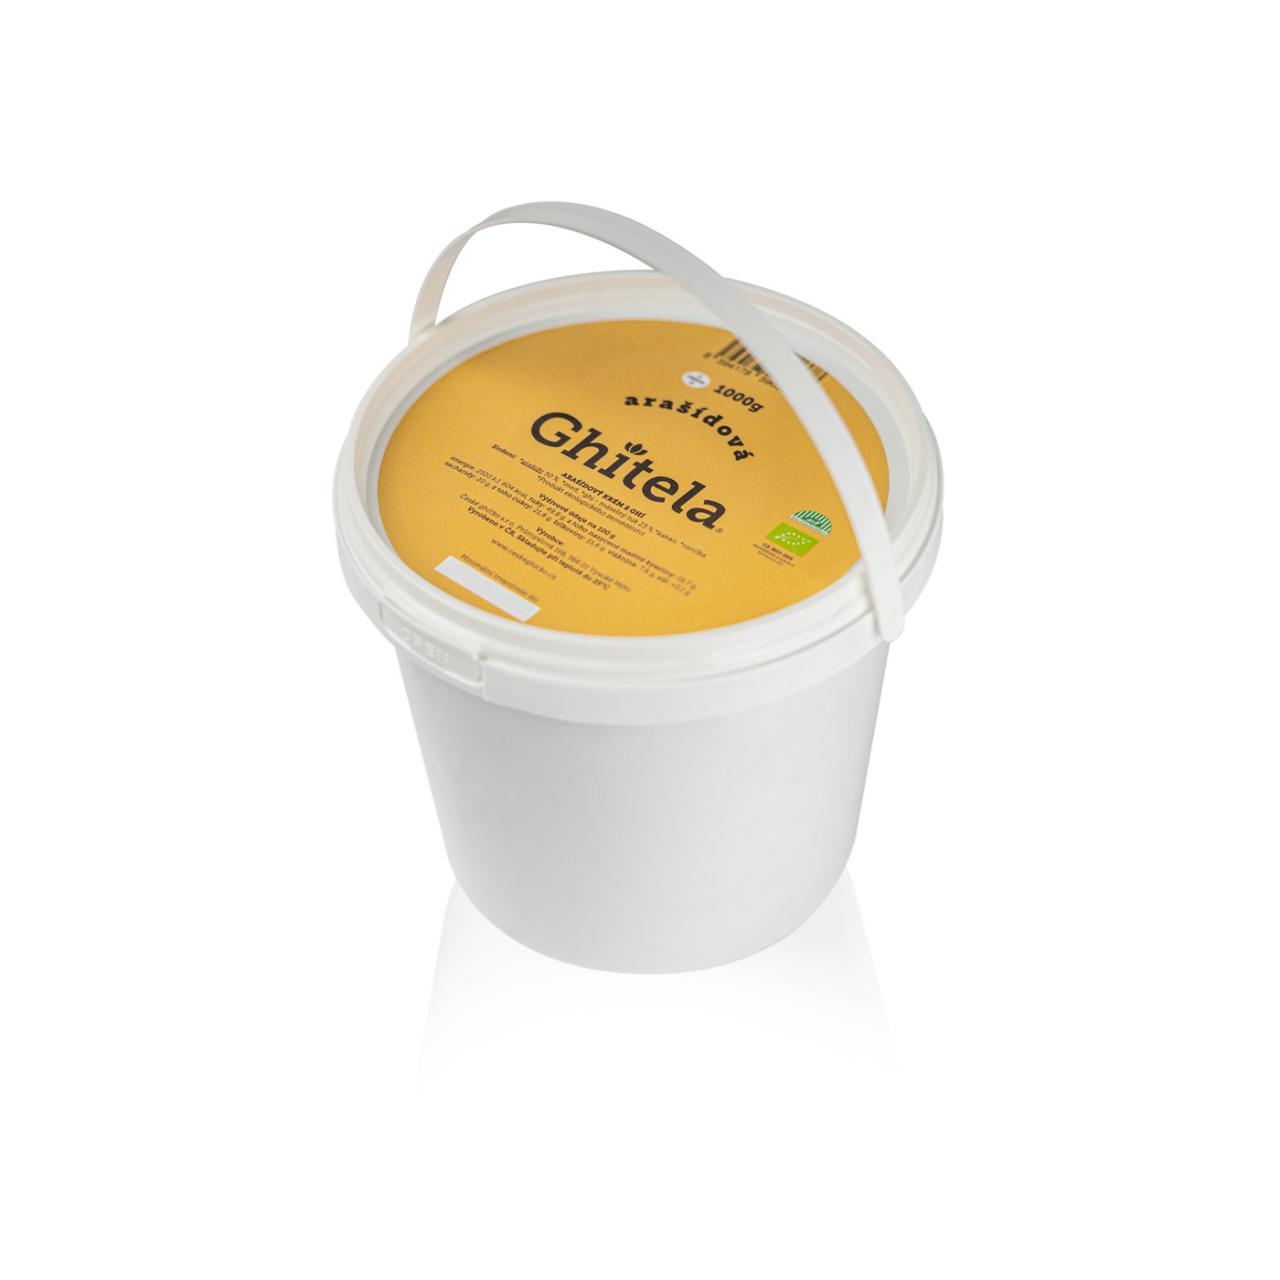 Ghitela® 1000g arašídová BIO